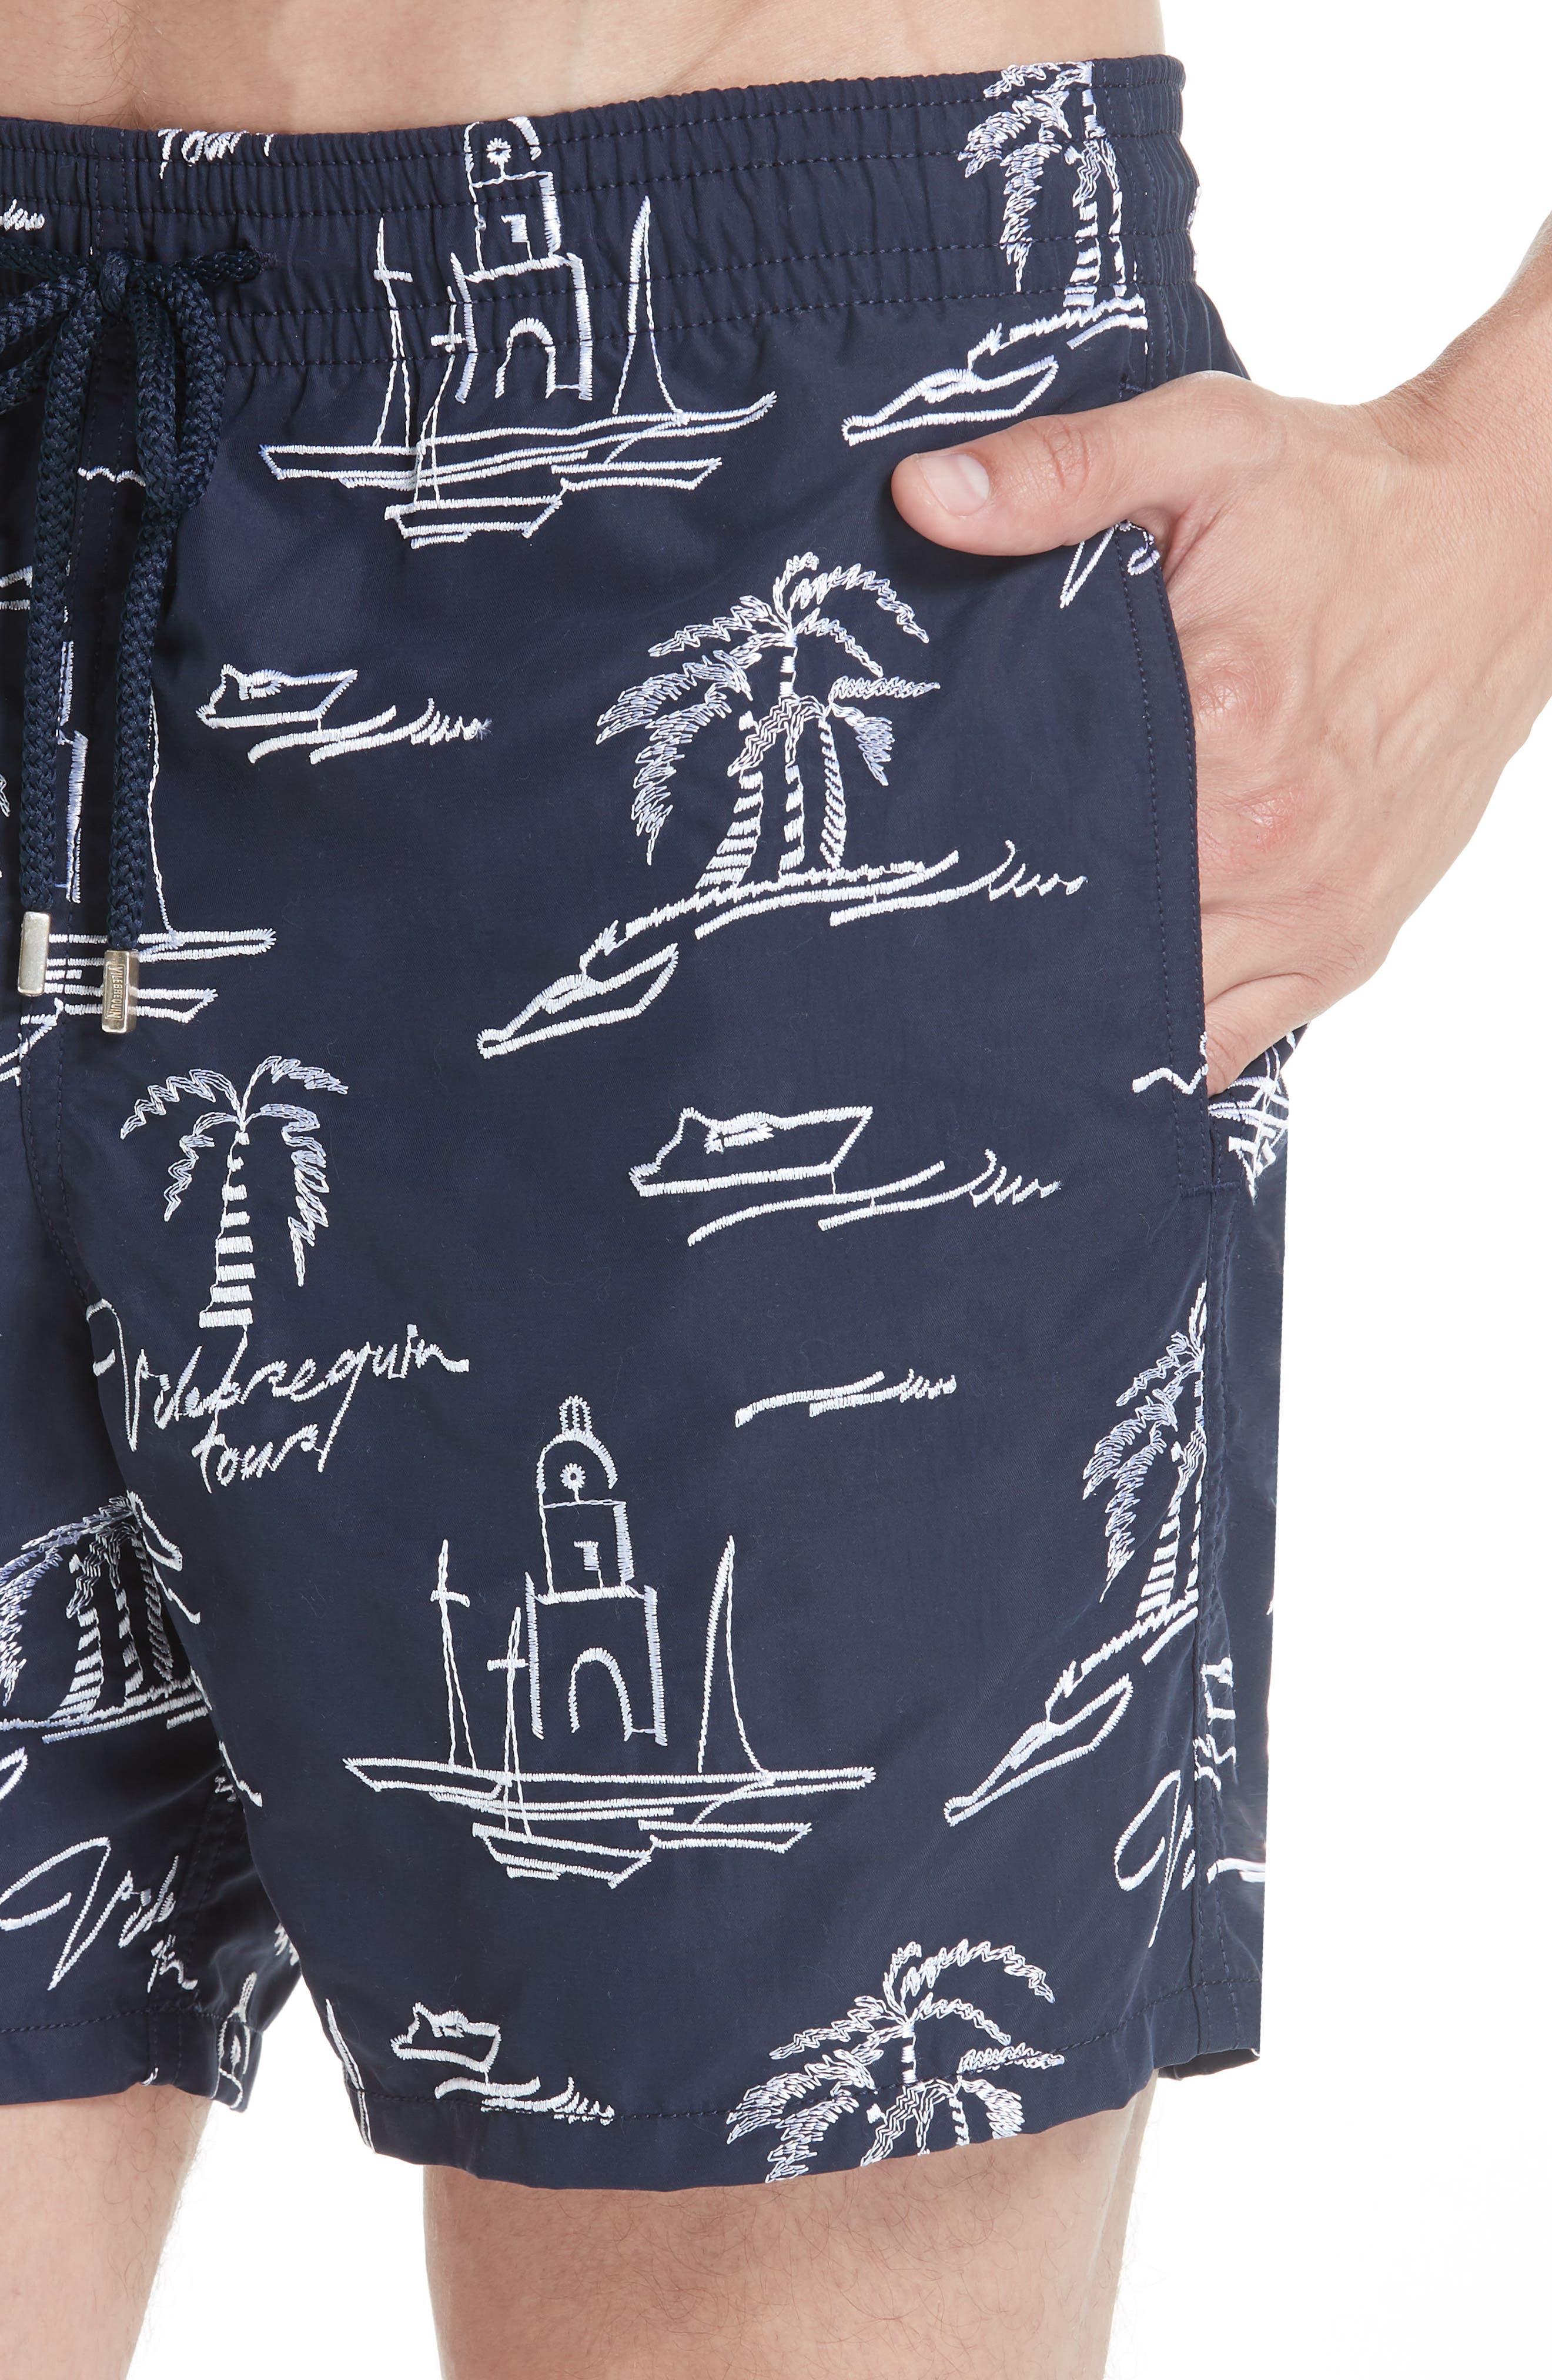 St. Tropez Embroidered Swim Trunks,                             Alternate thumbnail 4, color,                             BLUE